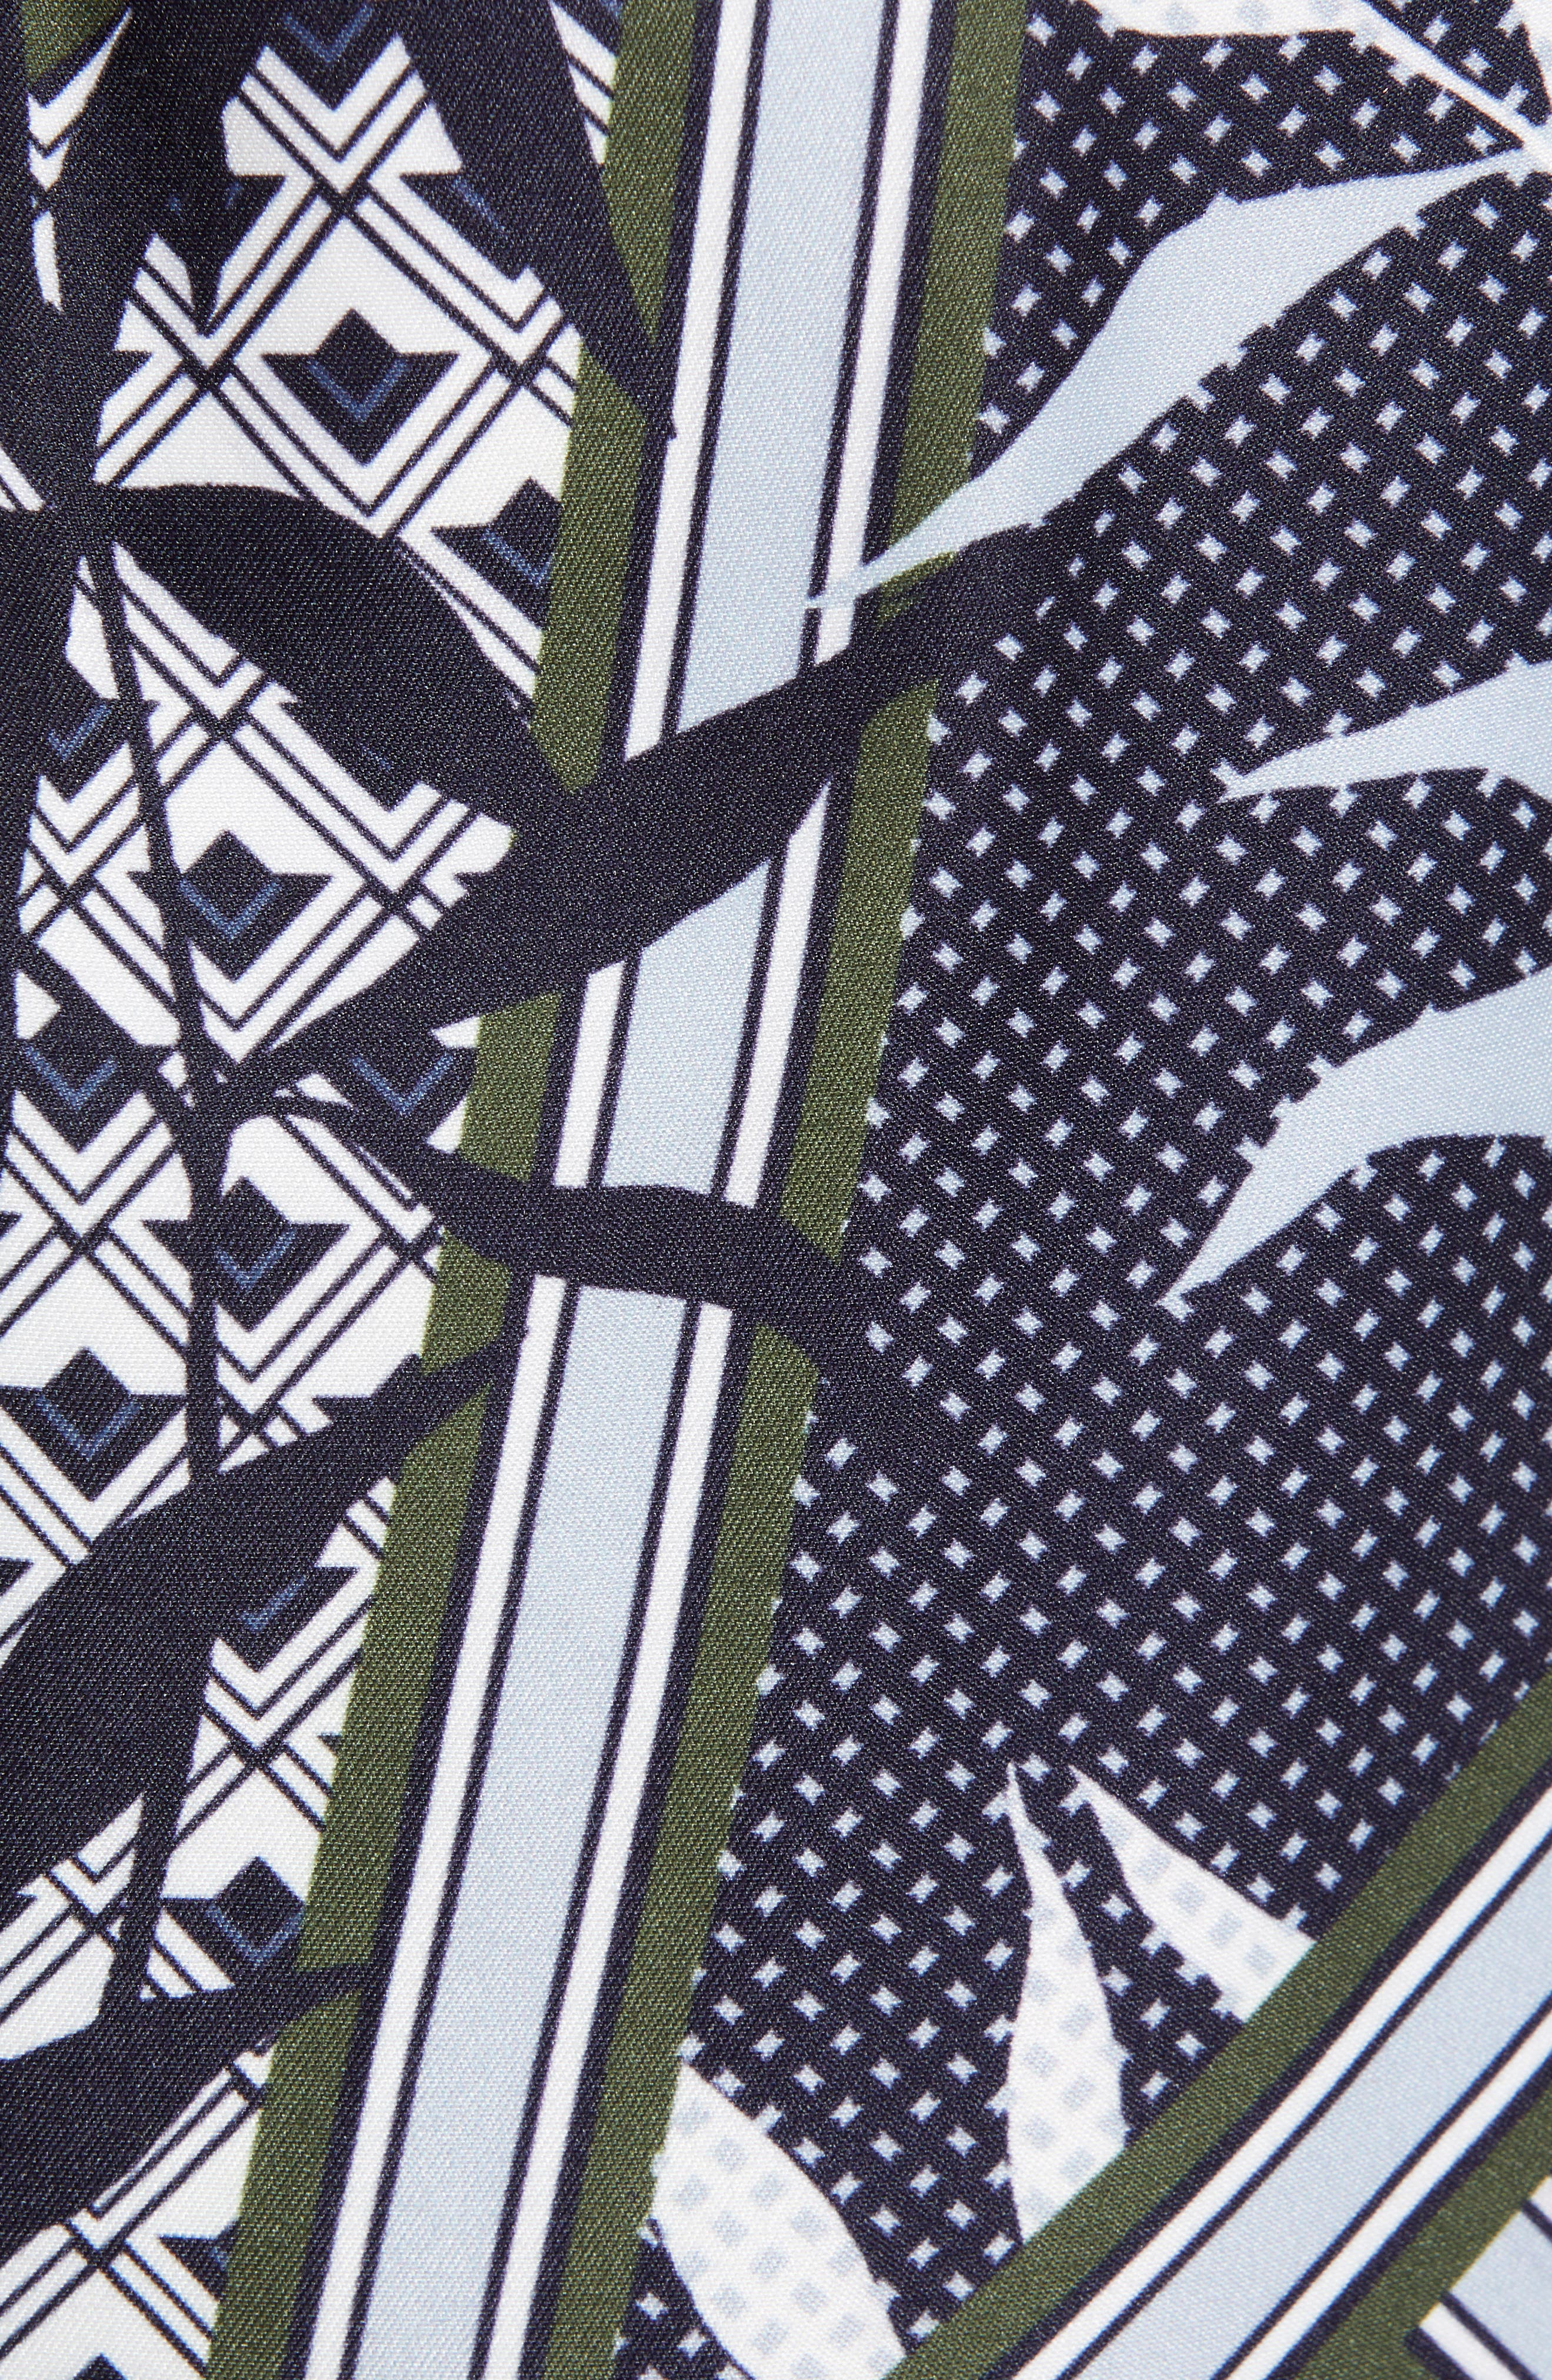 TED BAKER LONDON,                             Plecoe Slim Fit Floral Print Swim Trunks,                             Alternate thumbnail 5, color,                             410